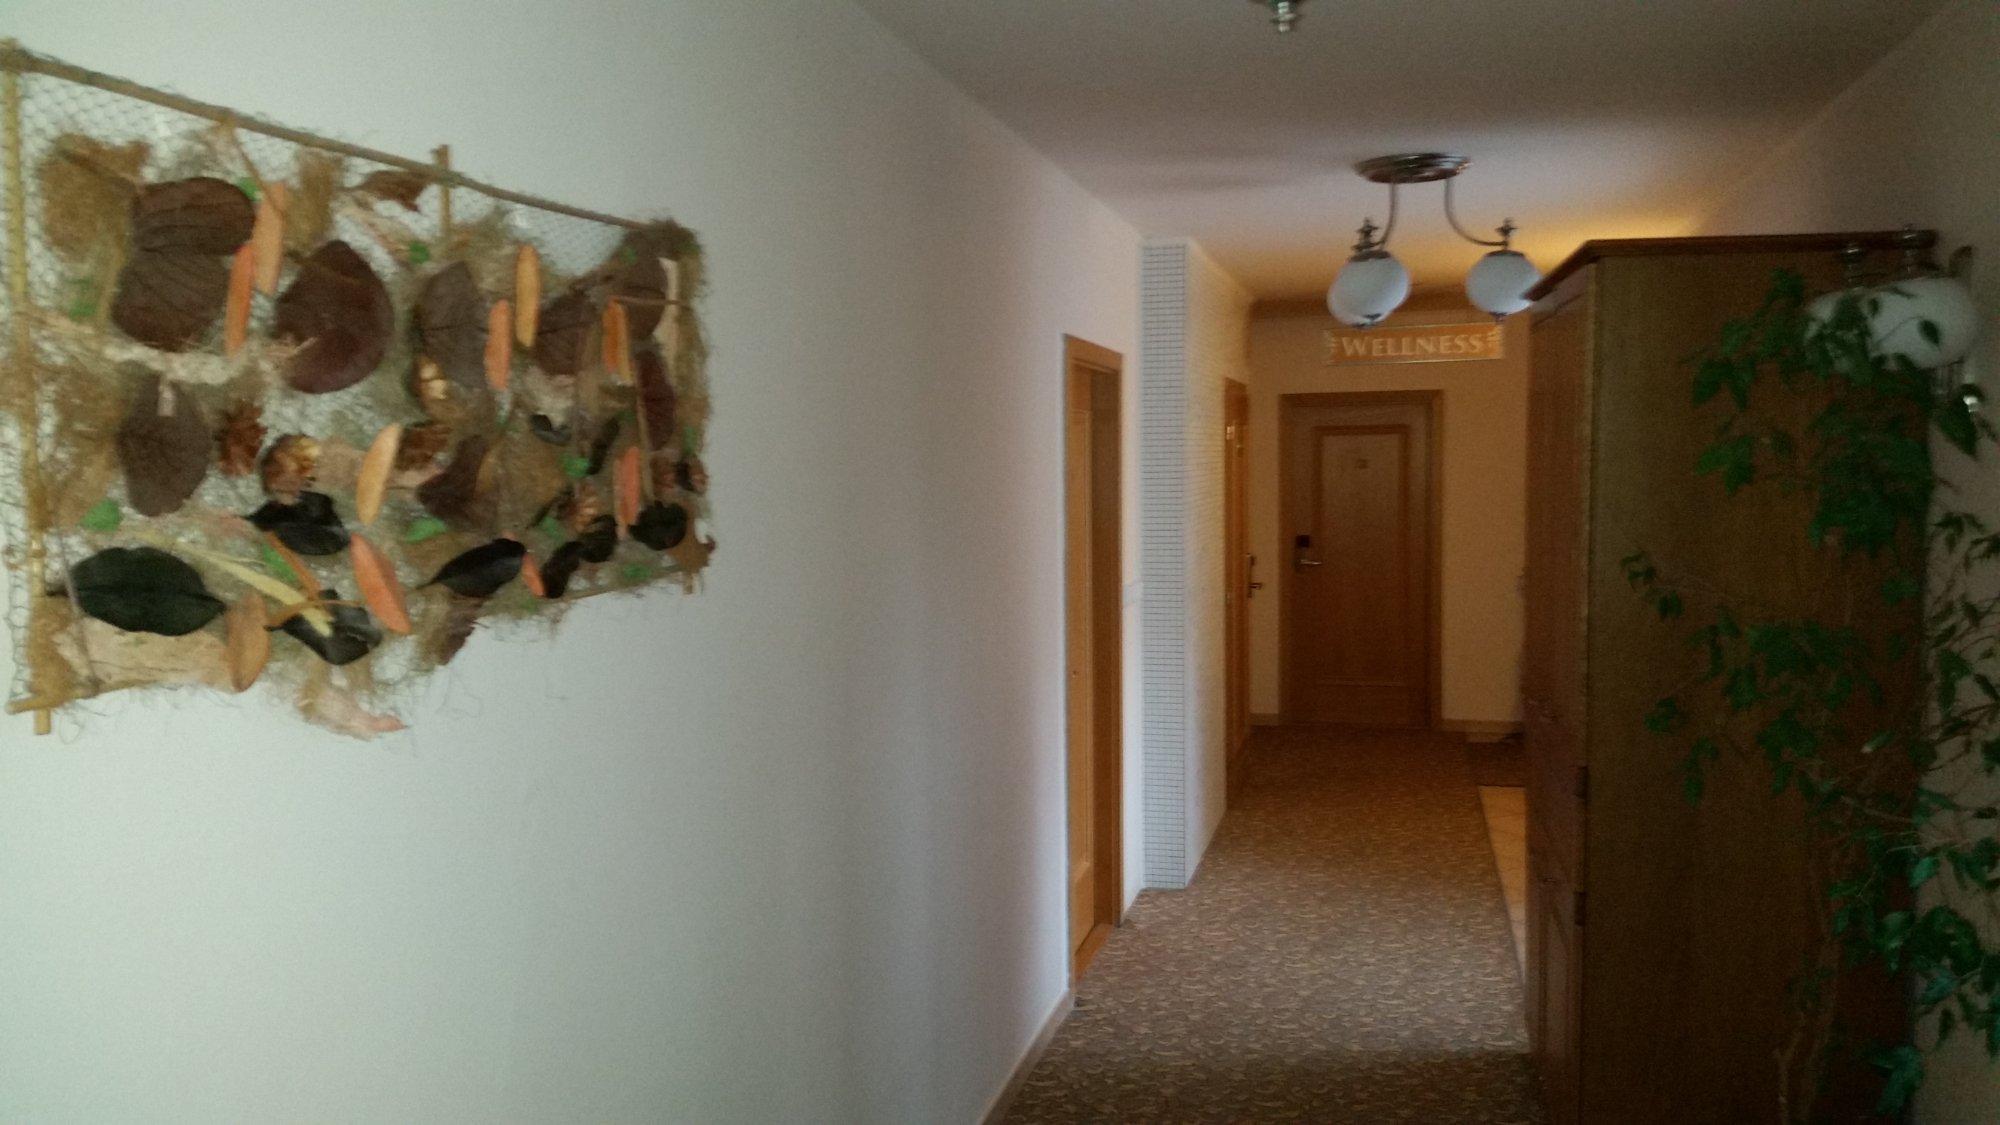 Zamecky Hotel Zlaty Orel